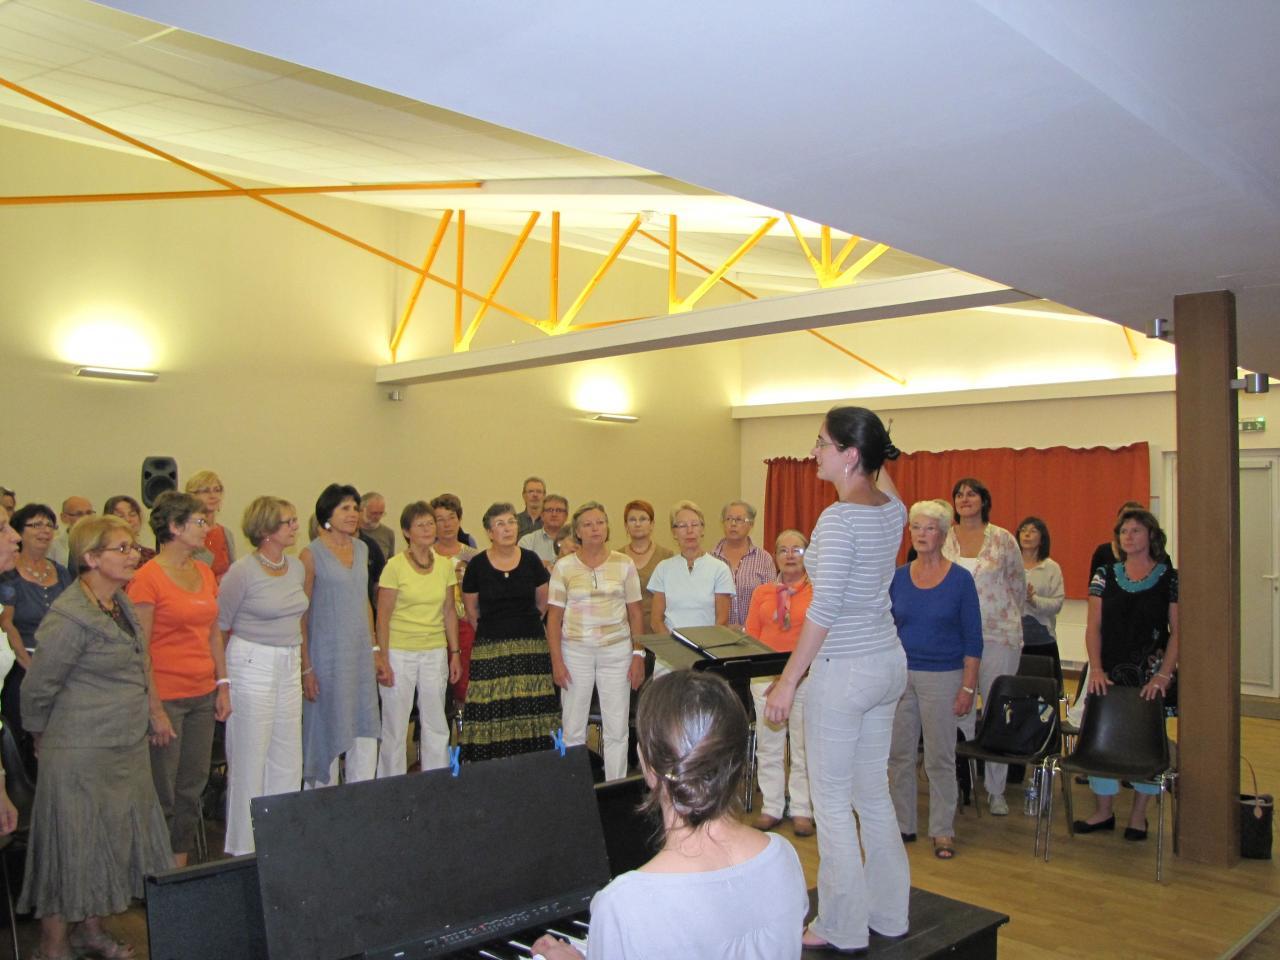 Harmonia septembre 2012 - Saint Pavace (Salle Touraine)